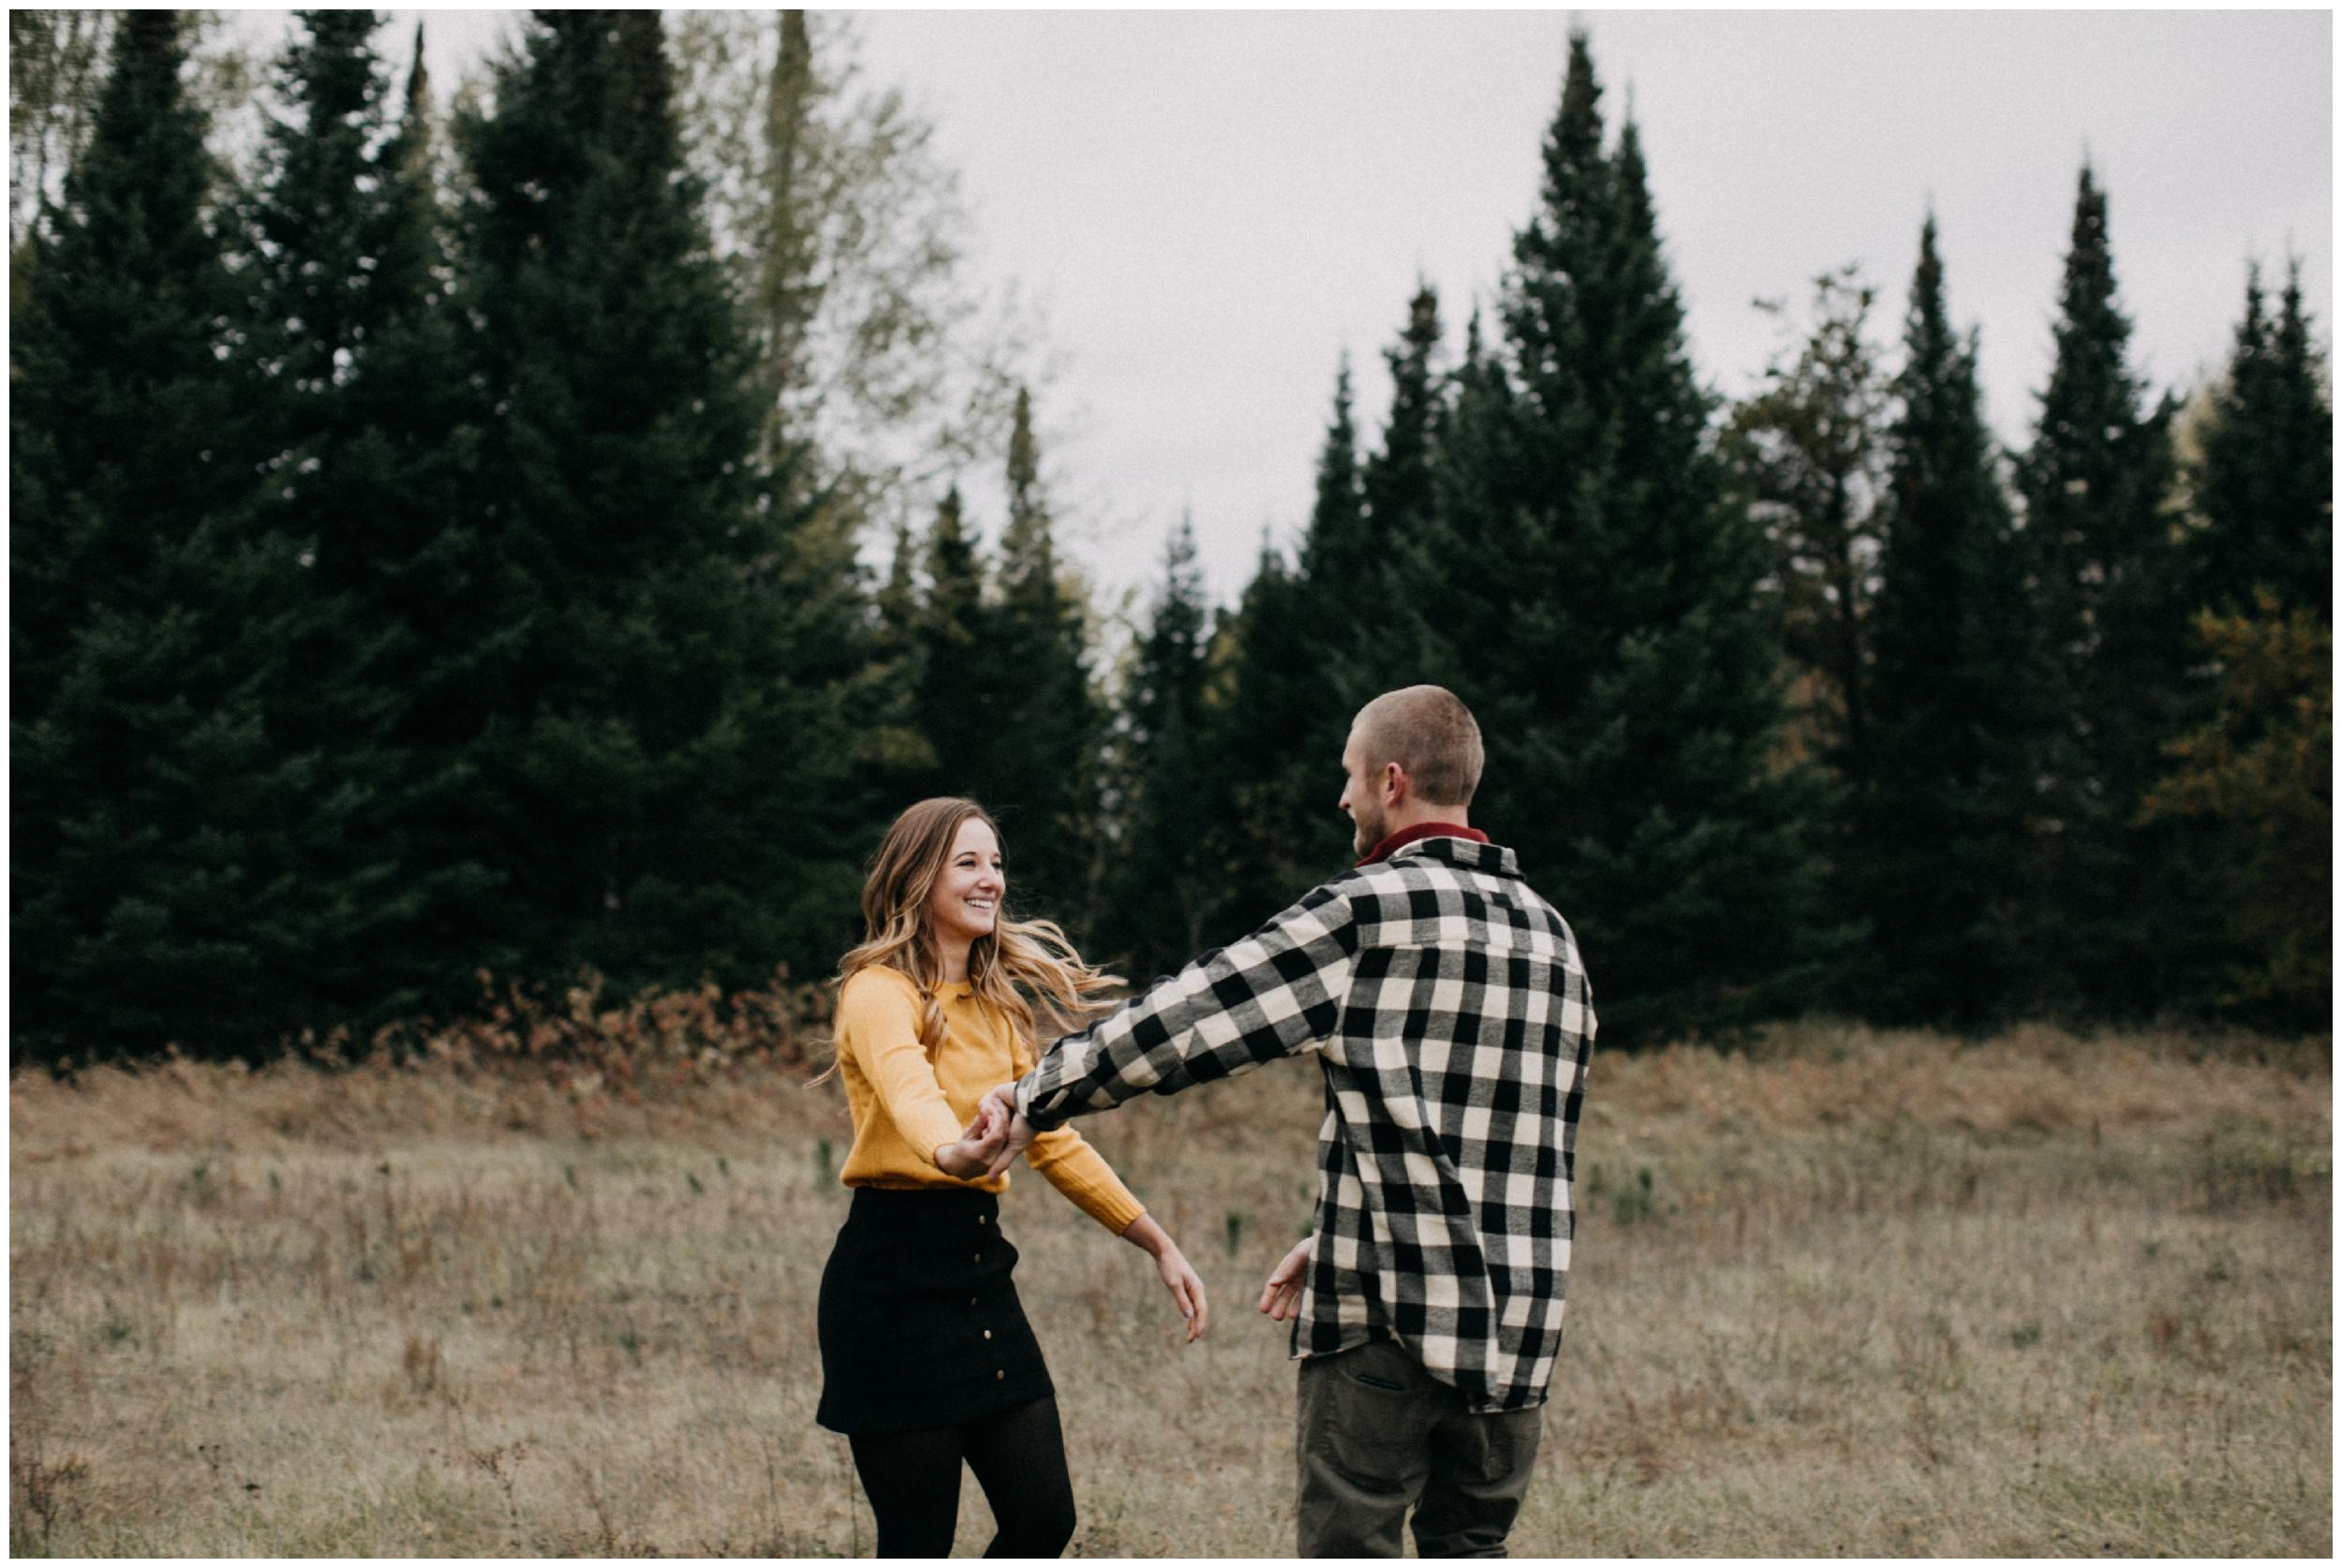 Pine tree forest engagement session by Brainerd Minnesota photographer Britt DeZeeuw